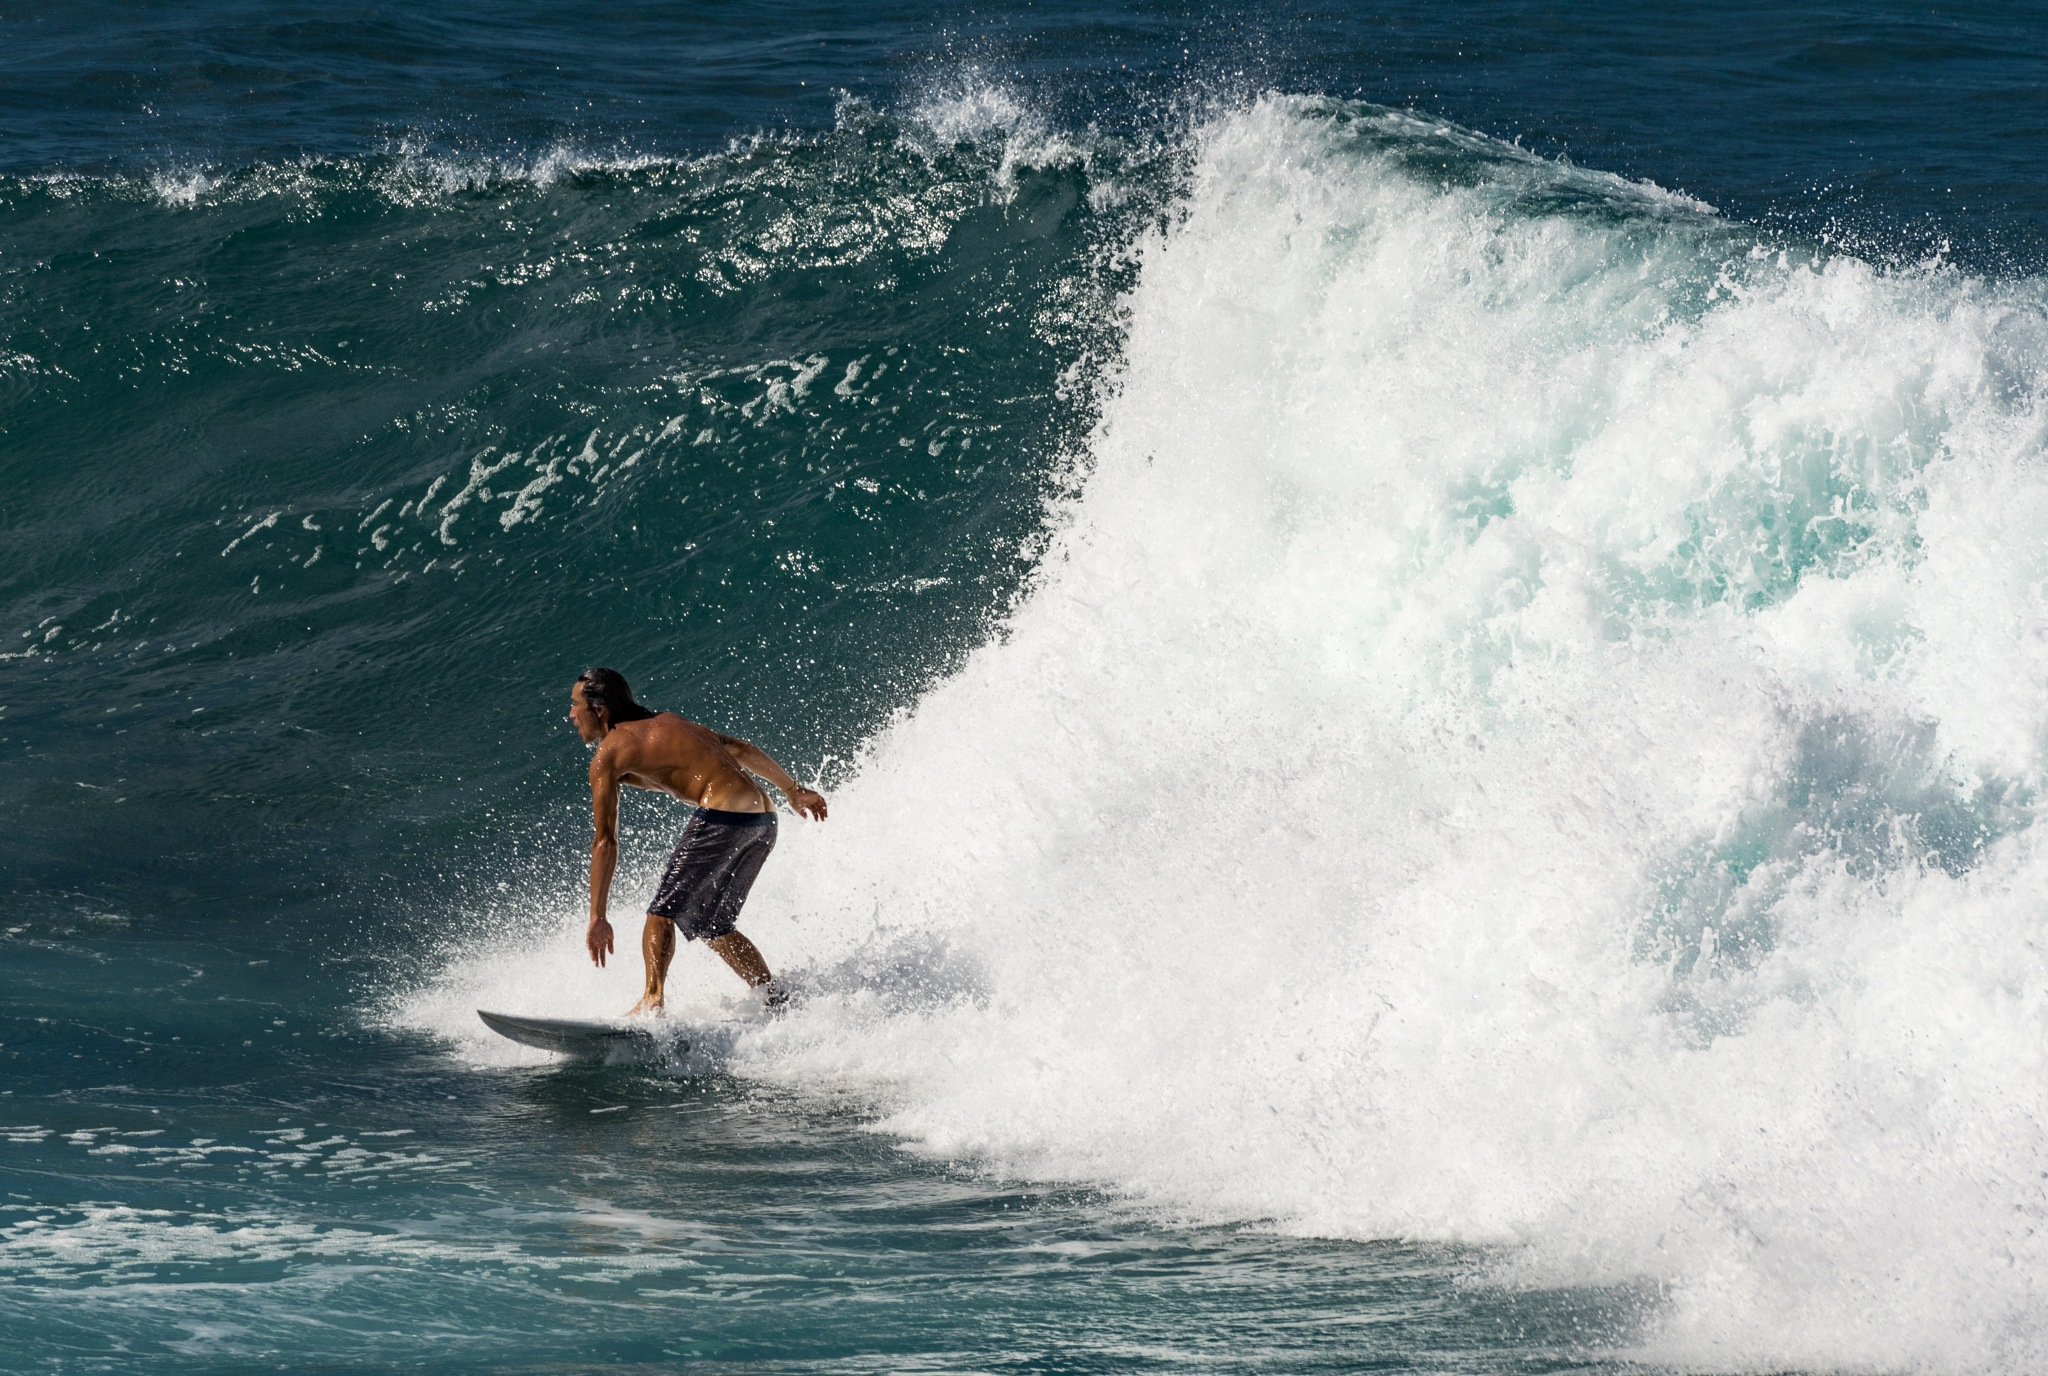 SURFER DUDE by DrJohnHodgson